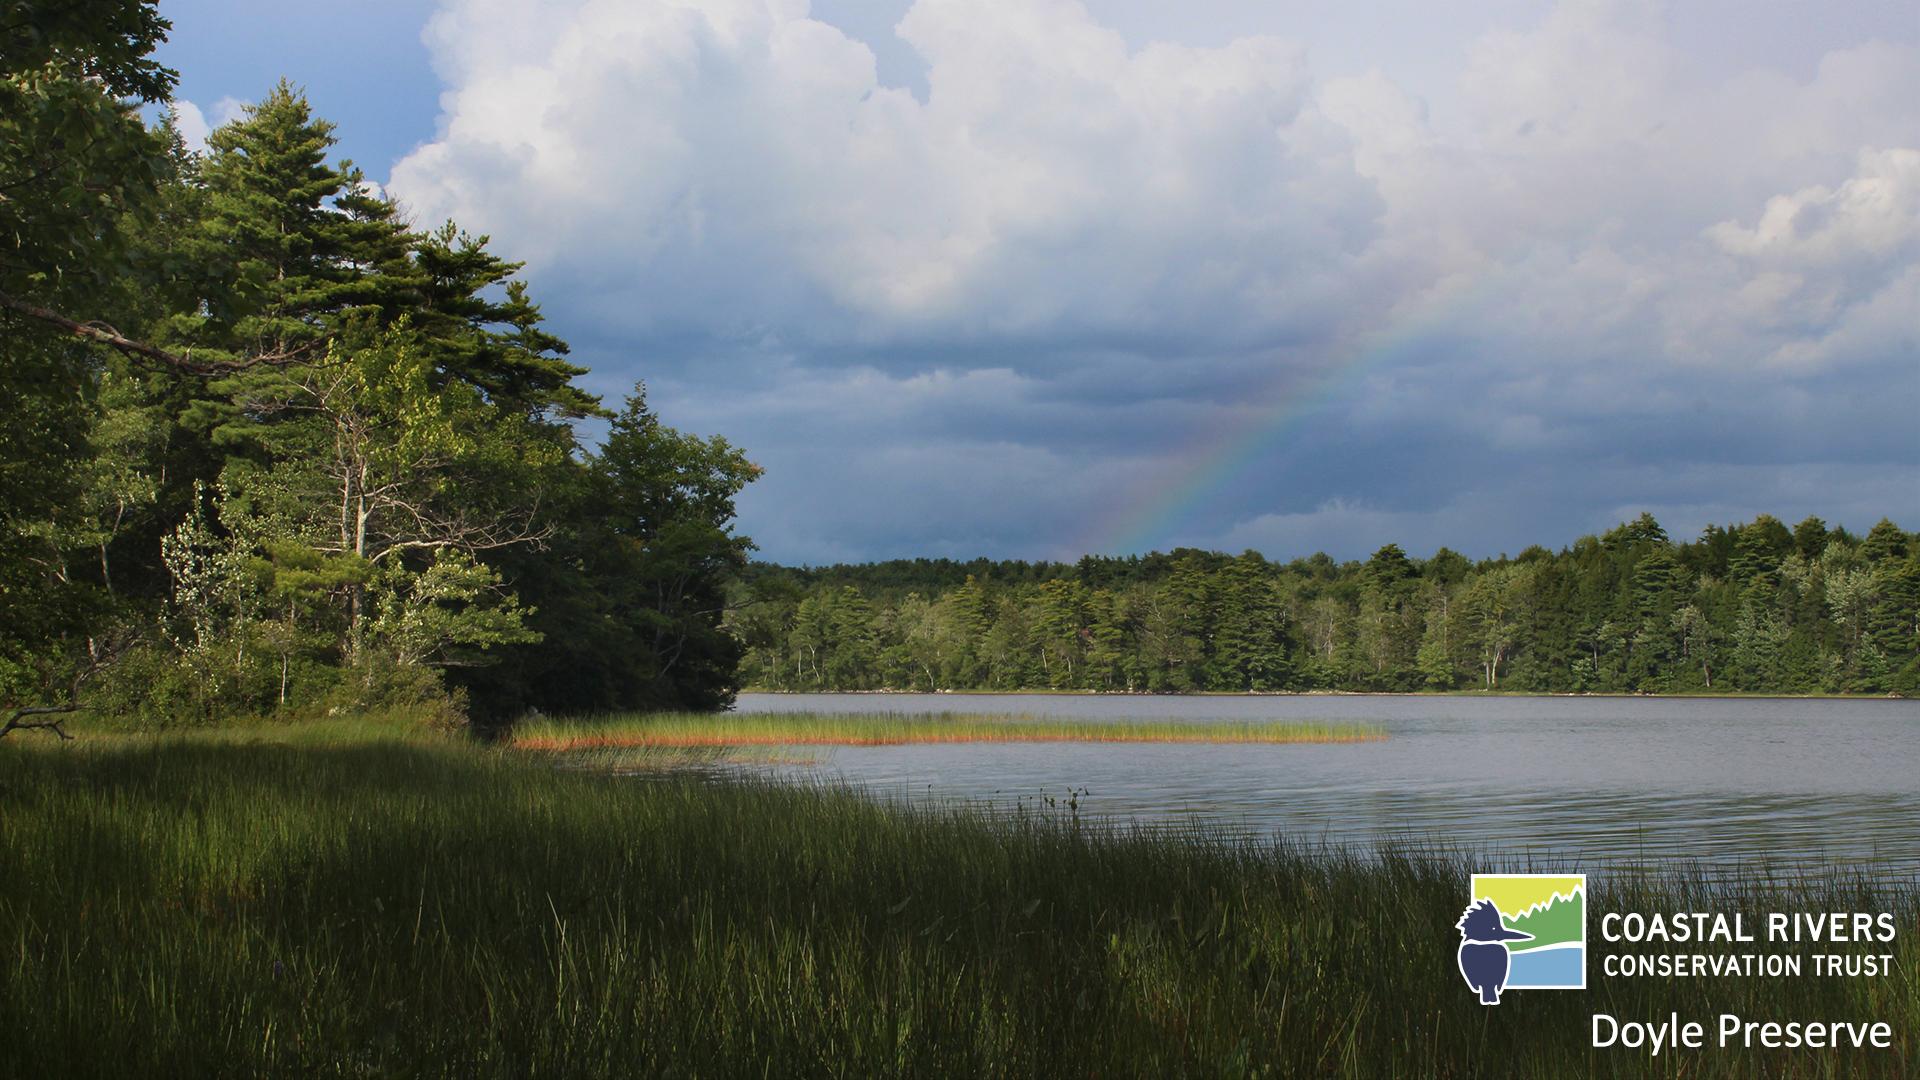 rainbow over Pemaquid Pond at Doyle Preserve